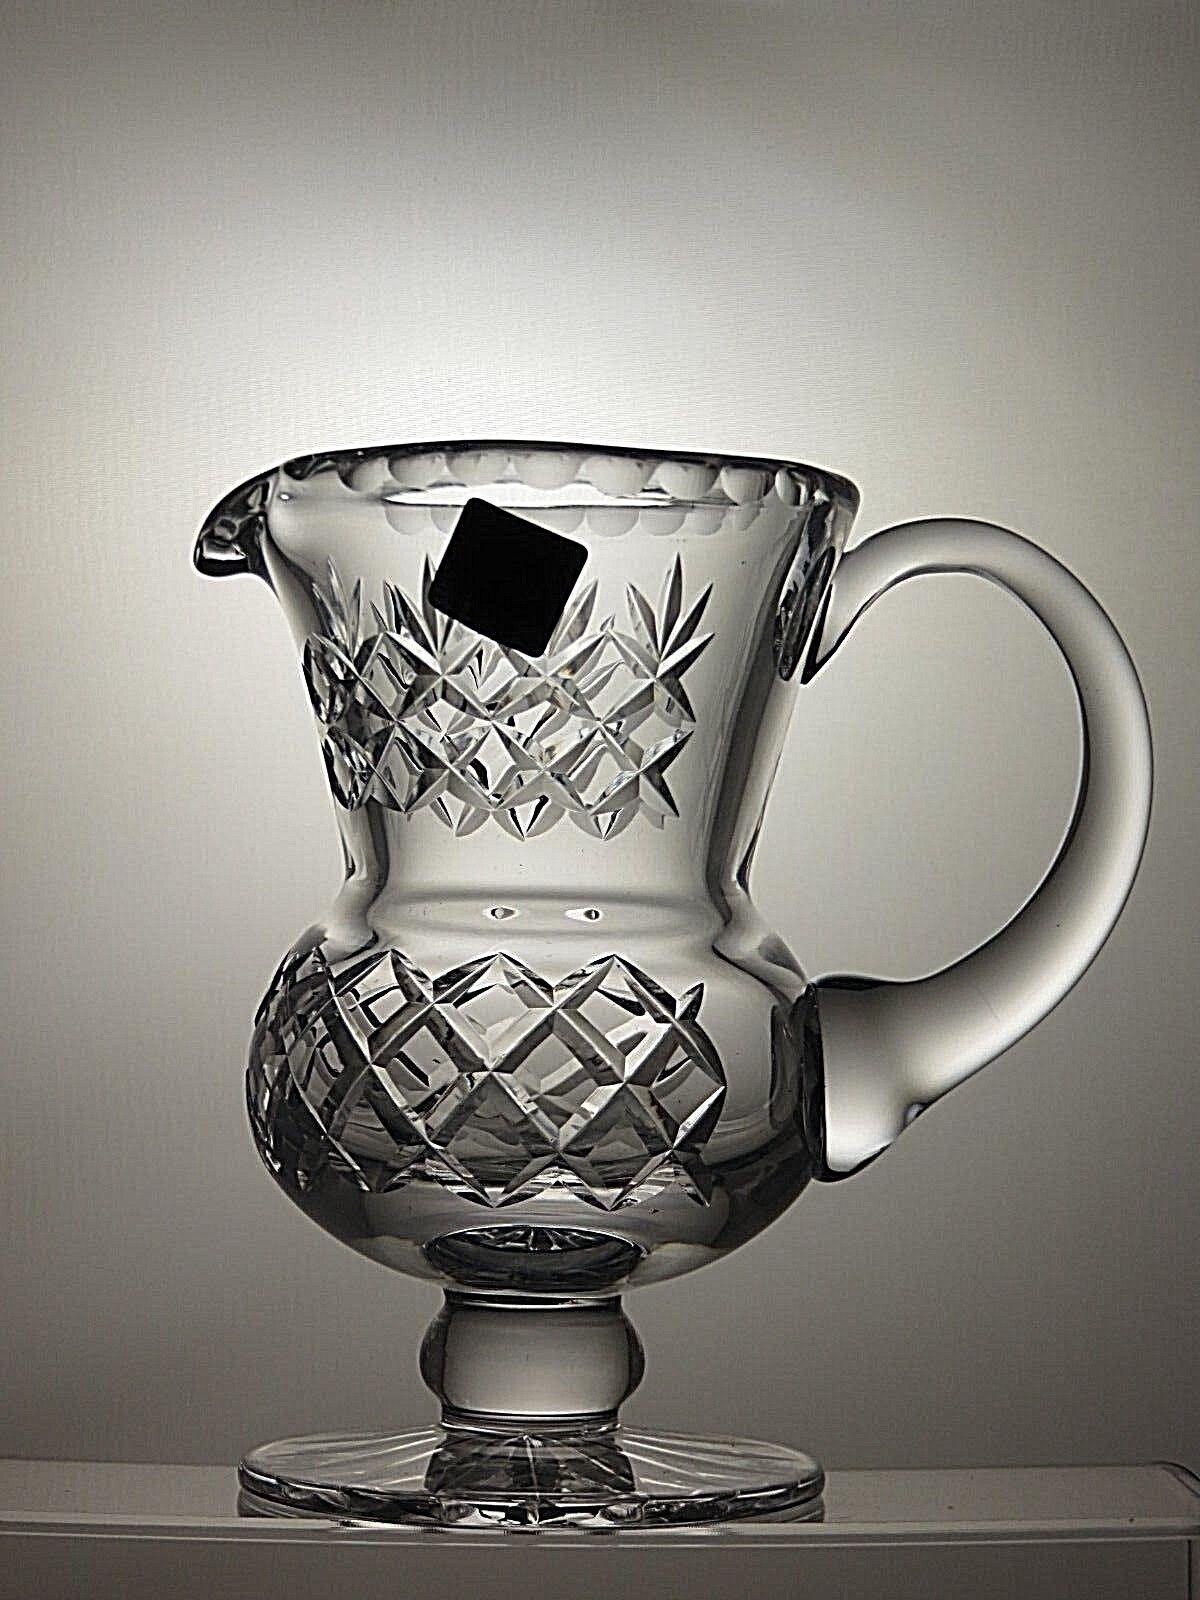 VINTAGE EDINBURGH CRYSTAL CUT GLASS JUG  PITCHER WITH HANDLE - 16 CM TALL